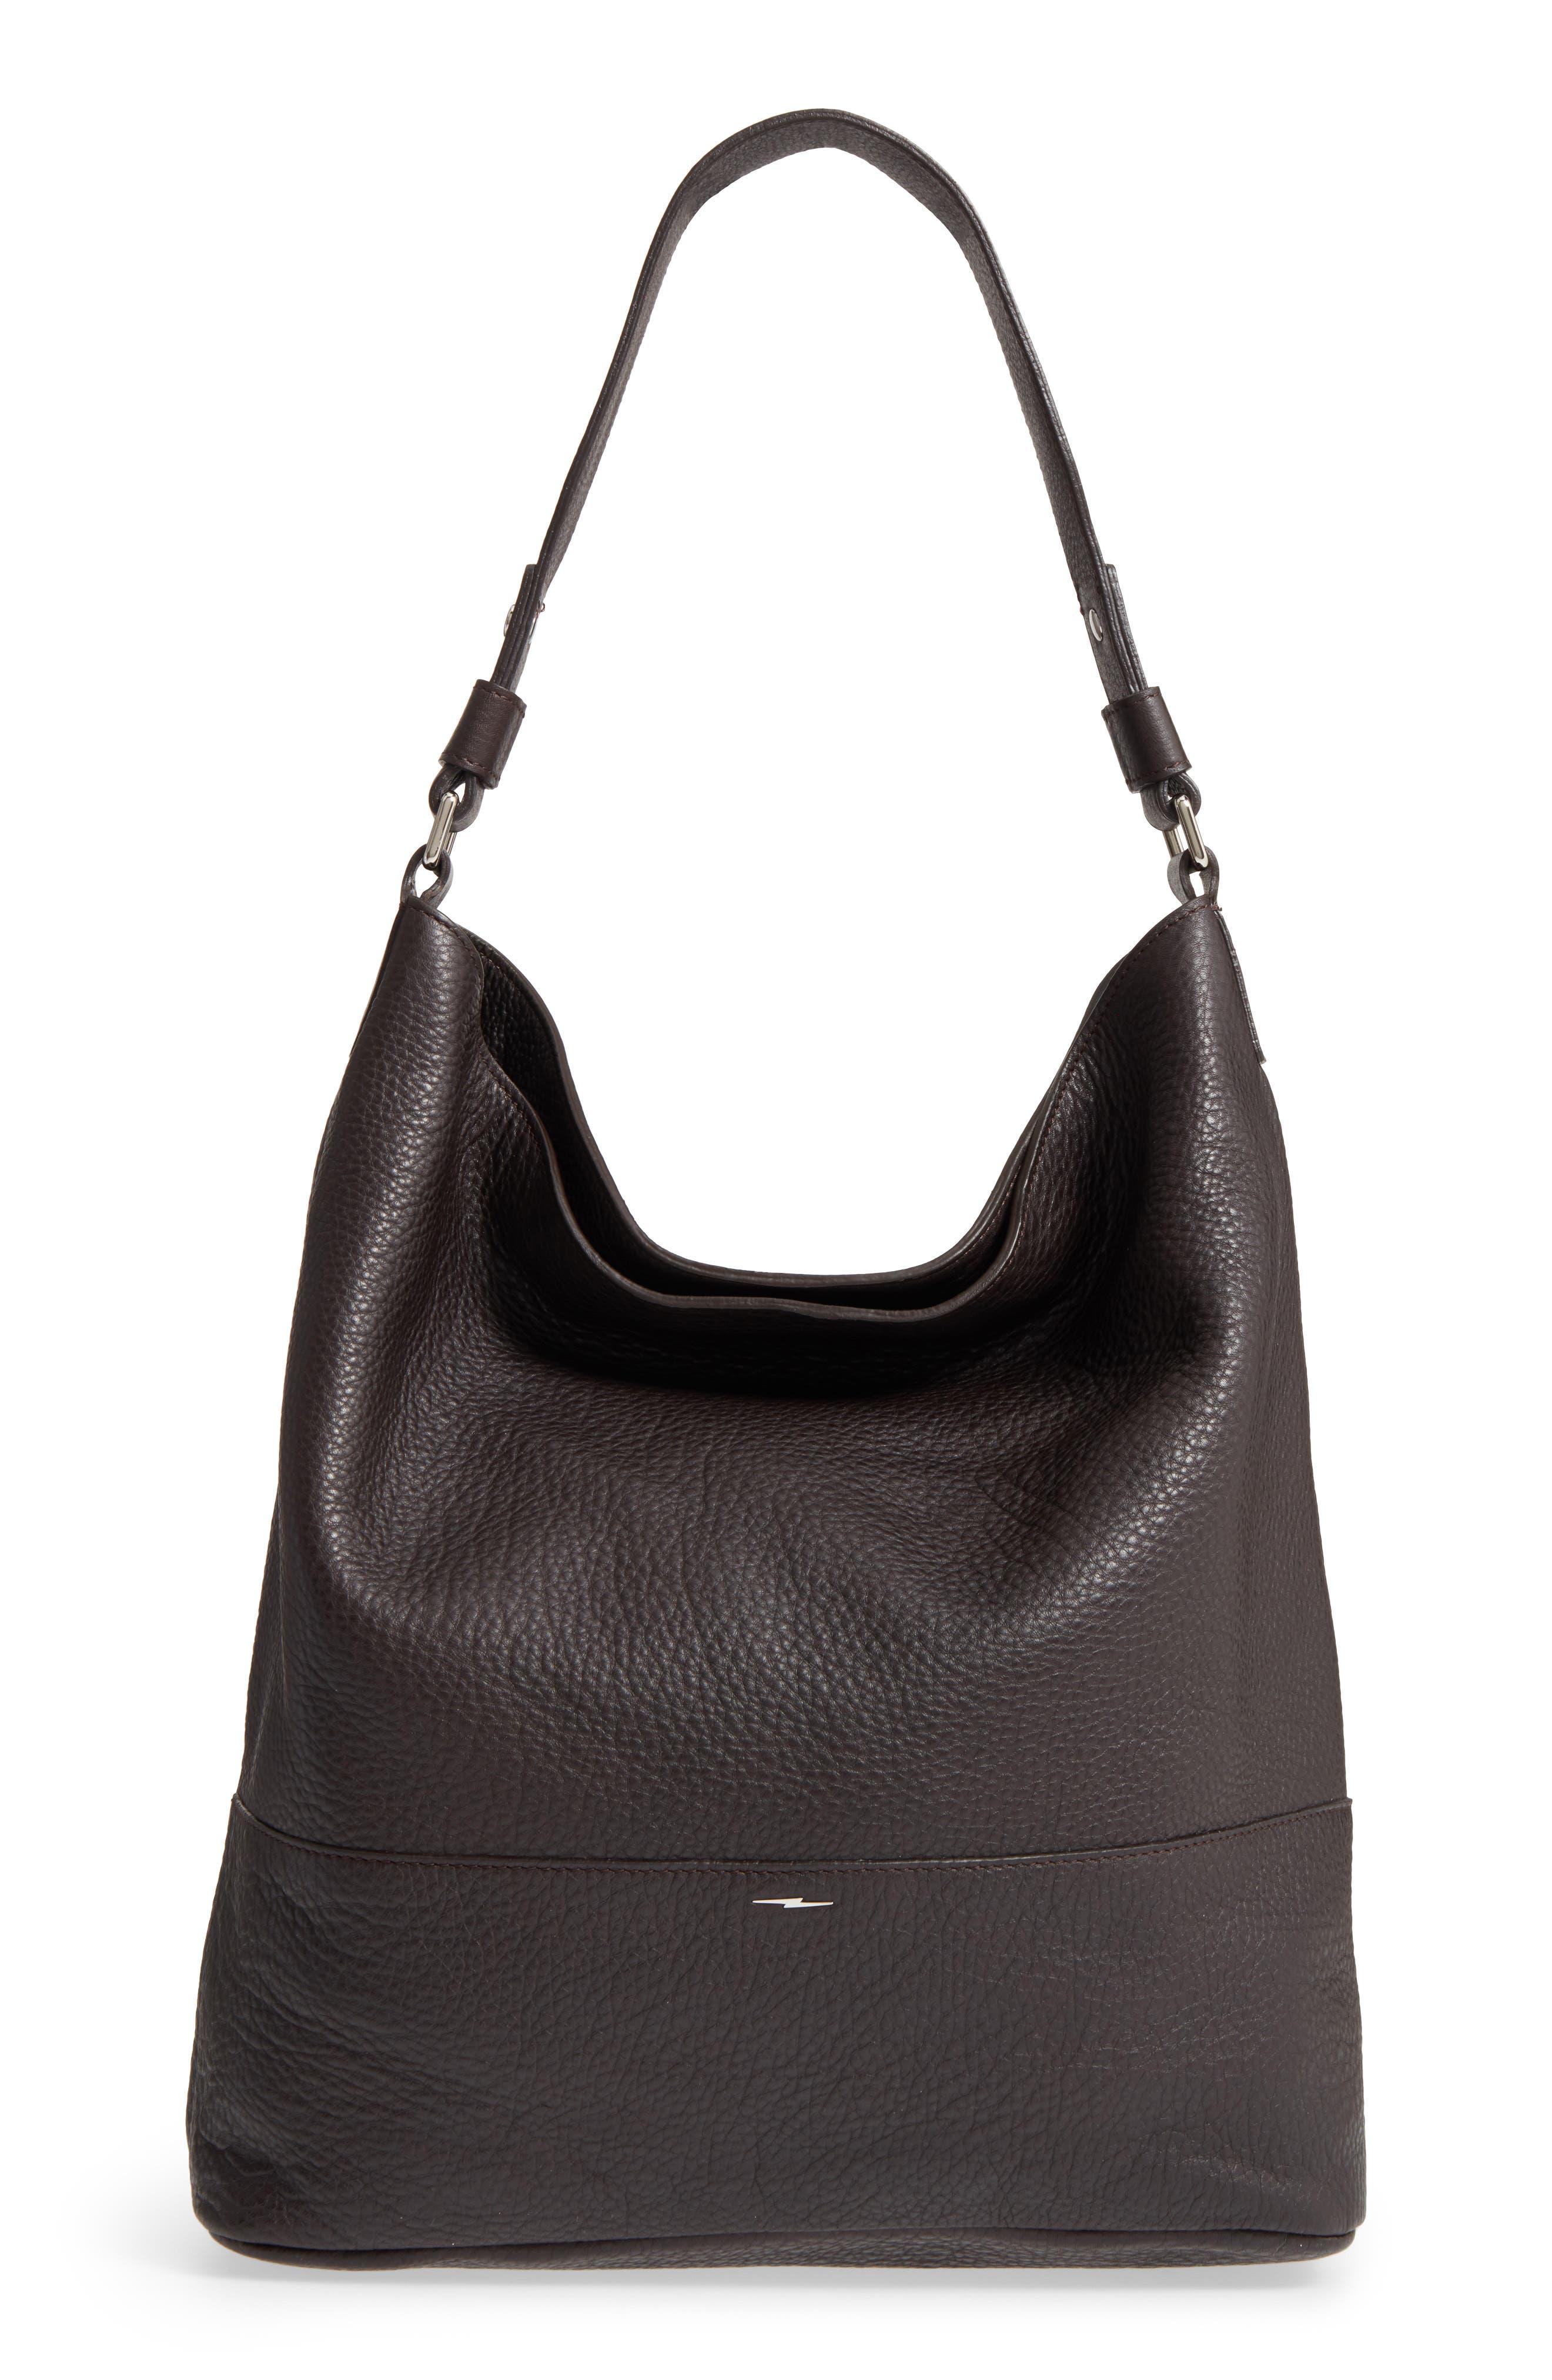 Alternate Image 1 Selected - Shinola Relaxed Calfskin Leather Hobo Bag